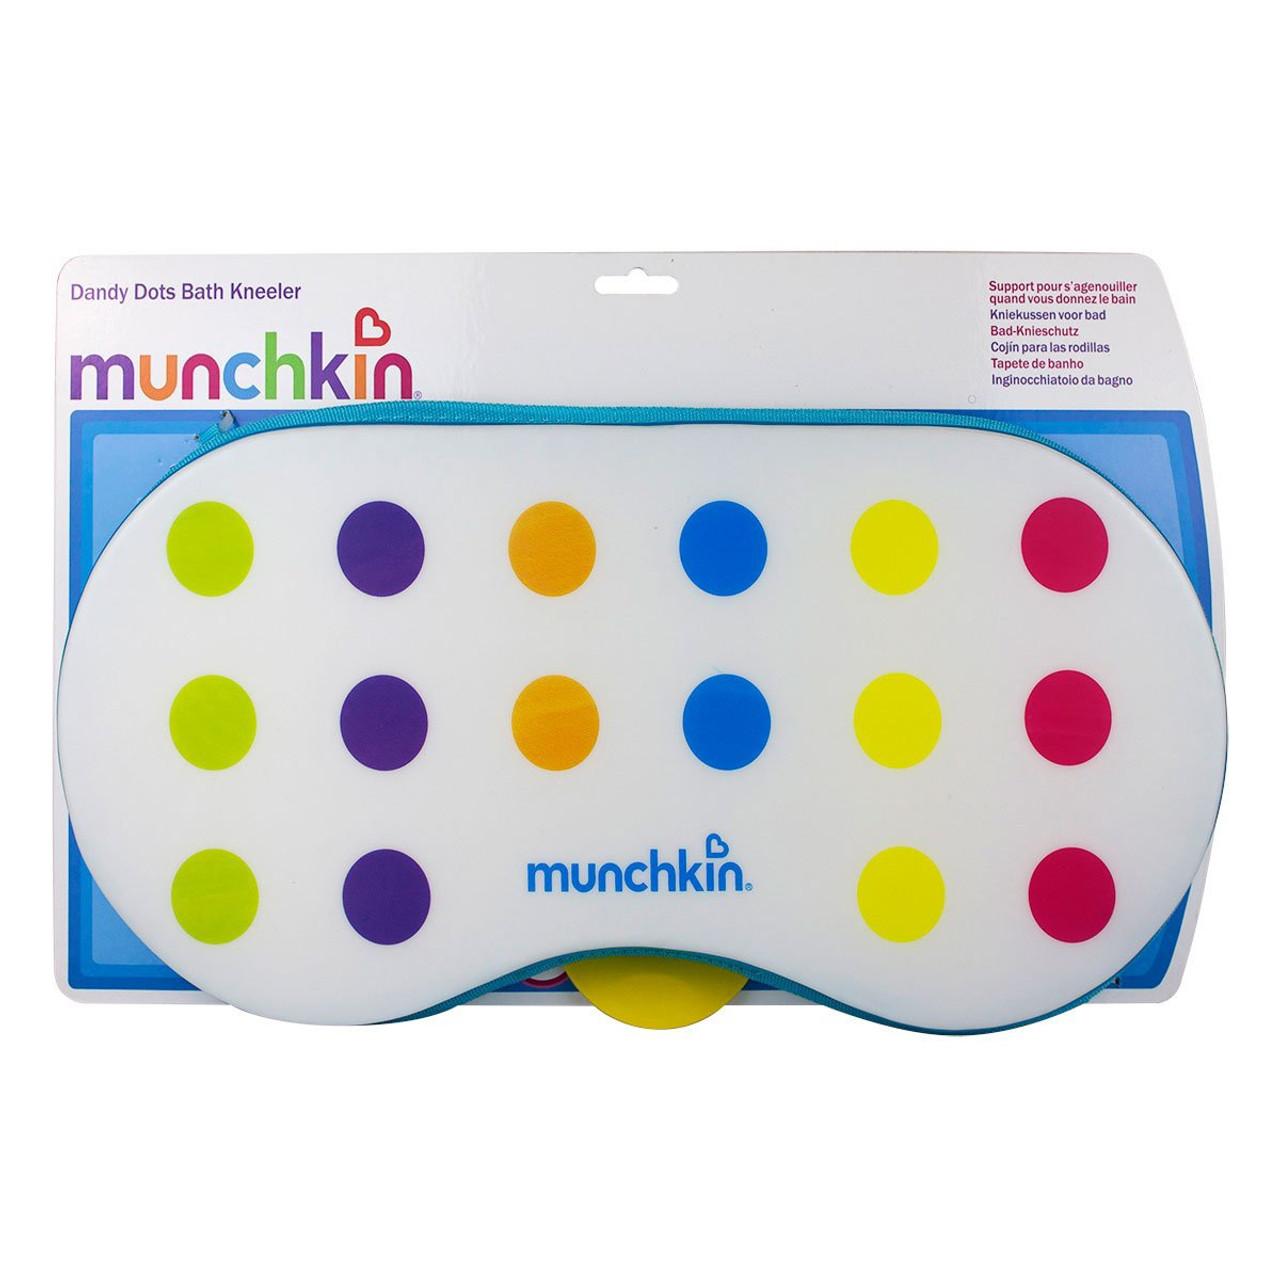 Munchkin Dots Bath Kneeler